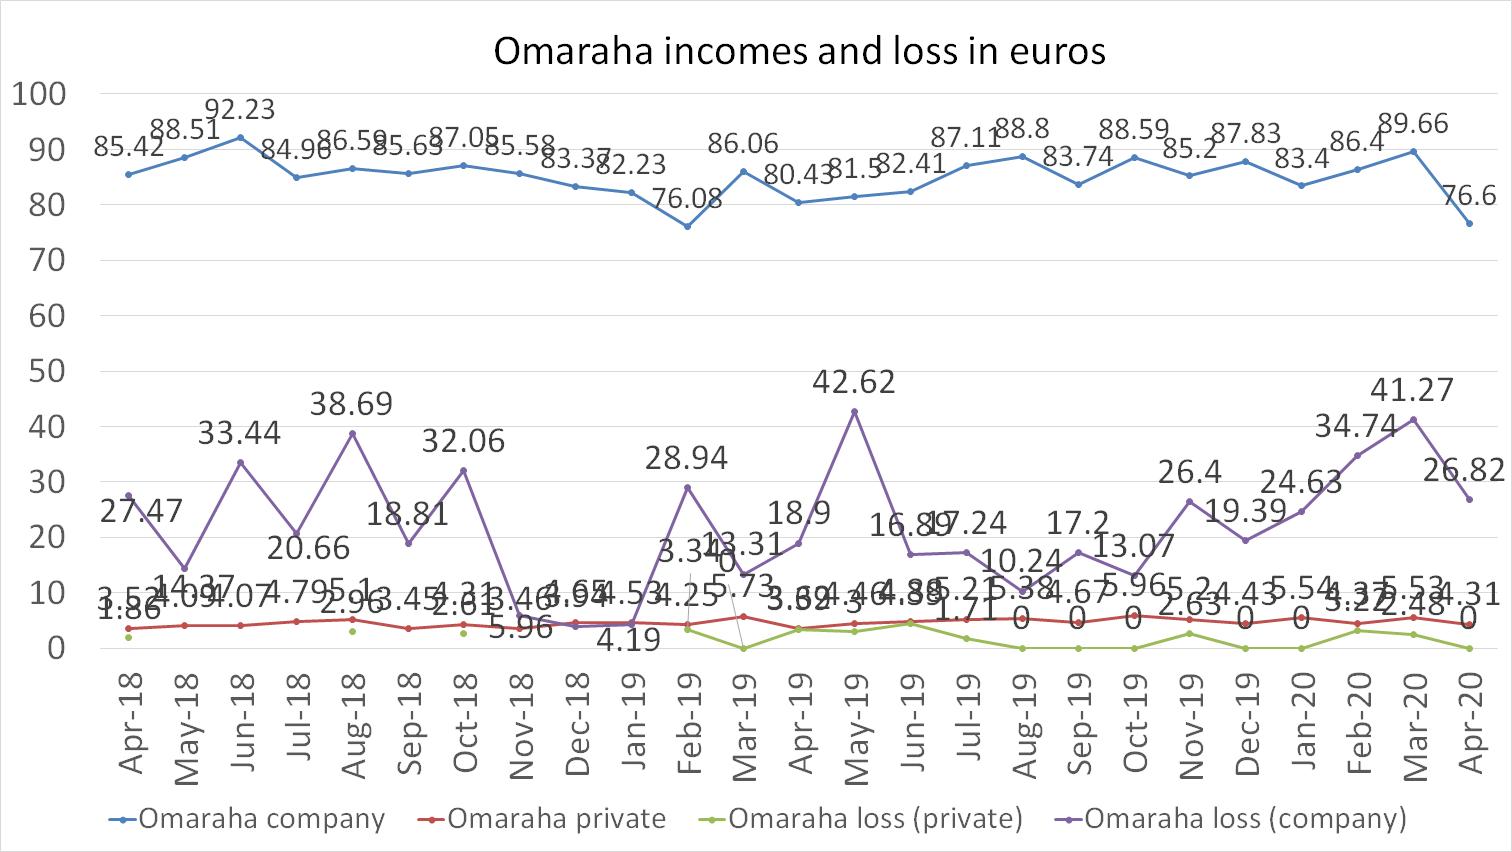 Omaraha incomes and loss in euros april 2020